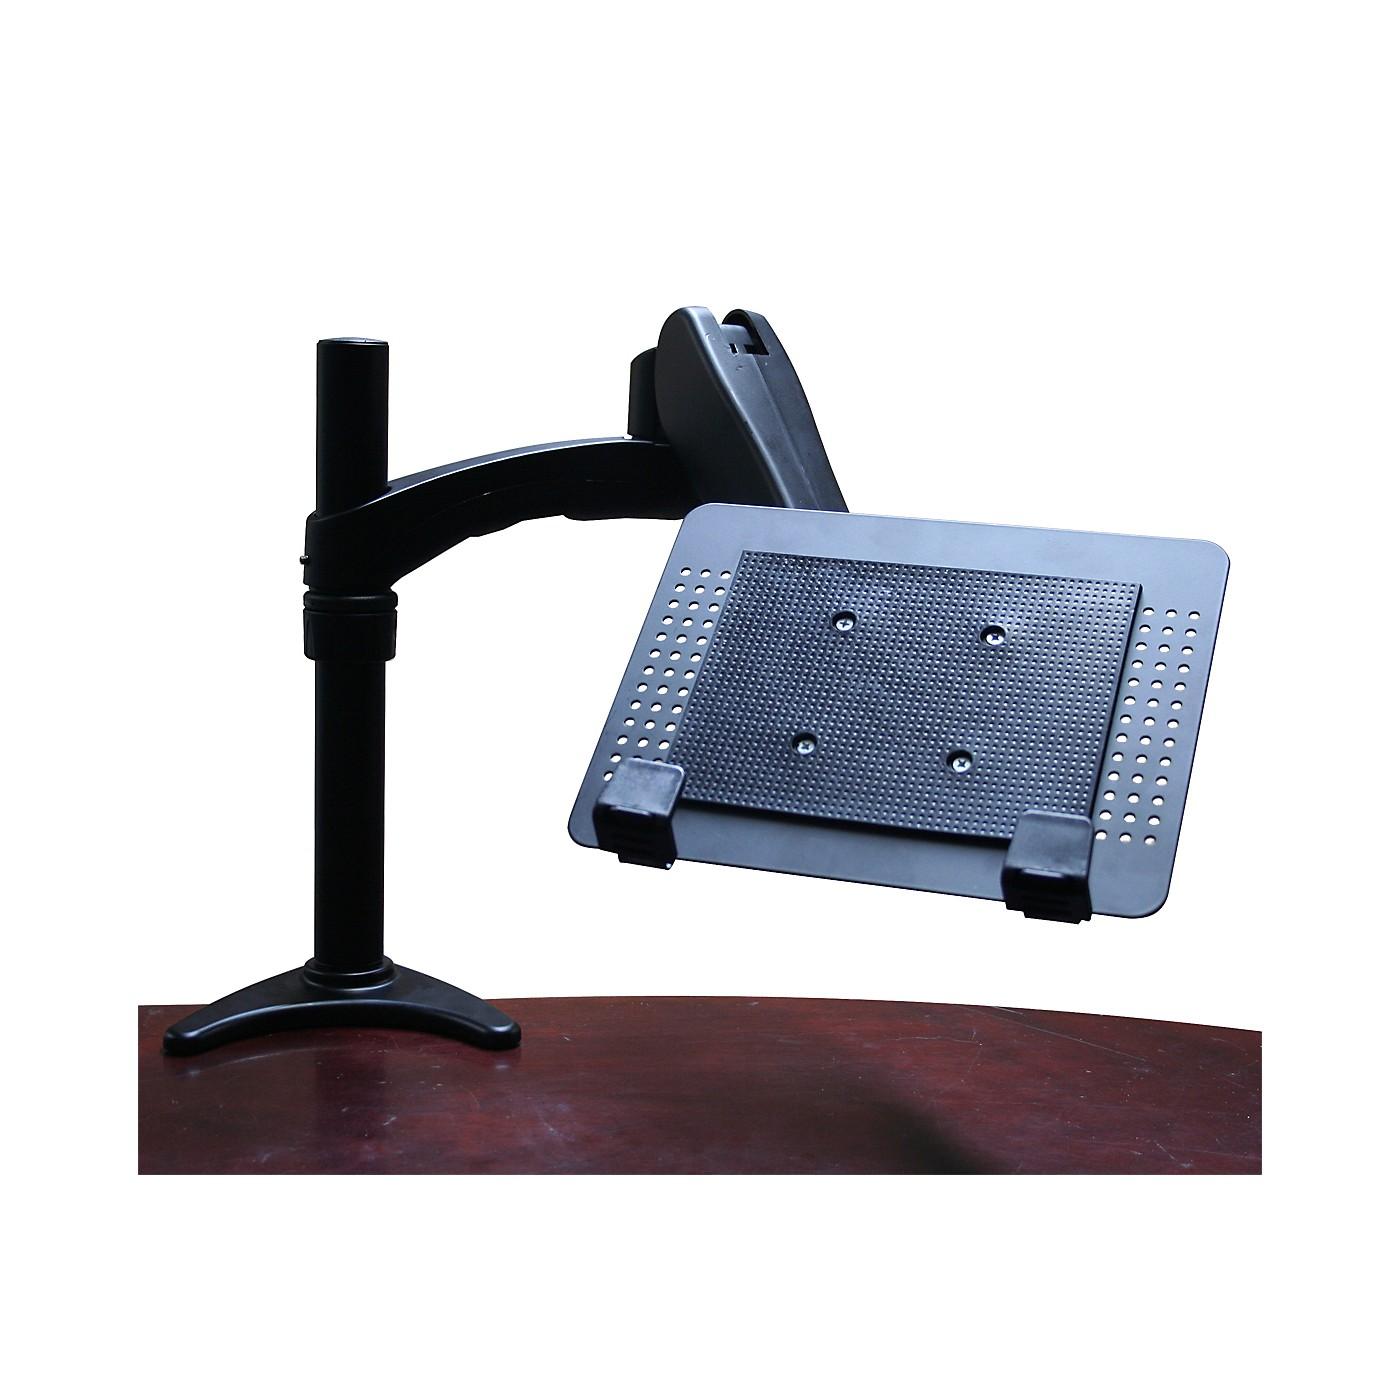 Gator 360 Degree Articulating Desk Mountable Arm thumbnail